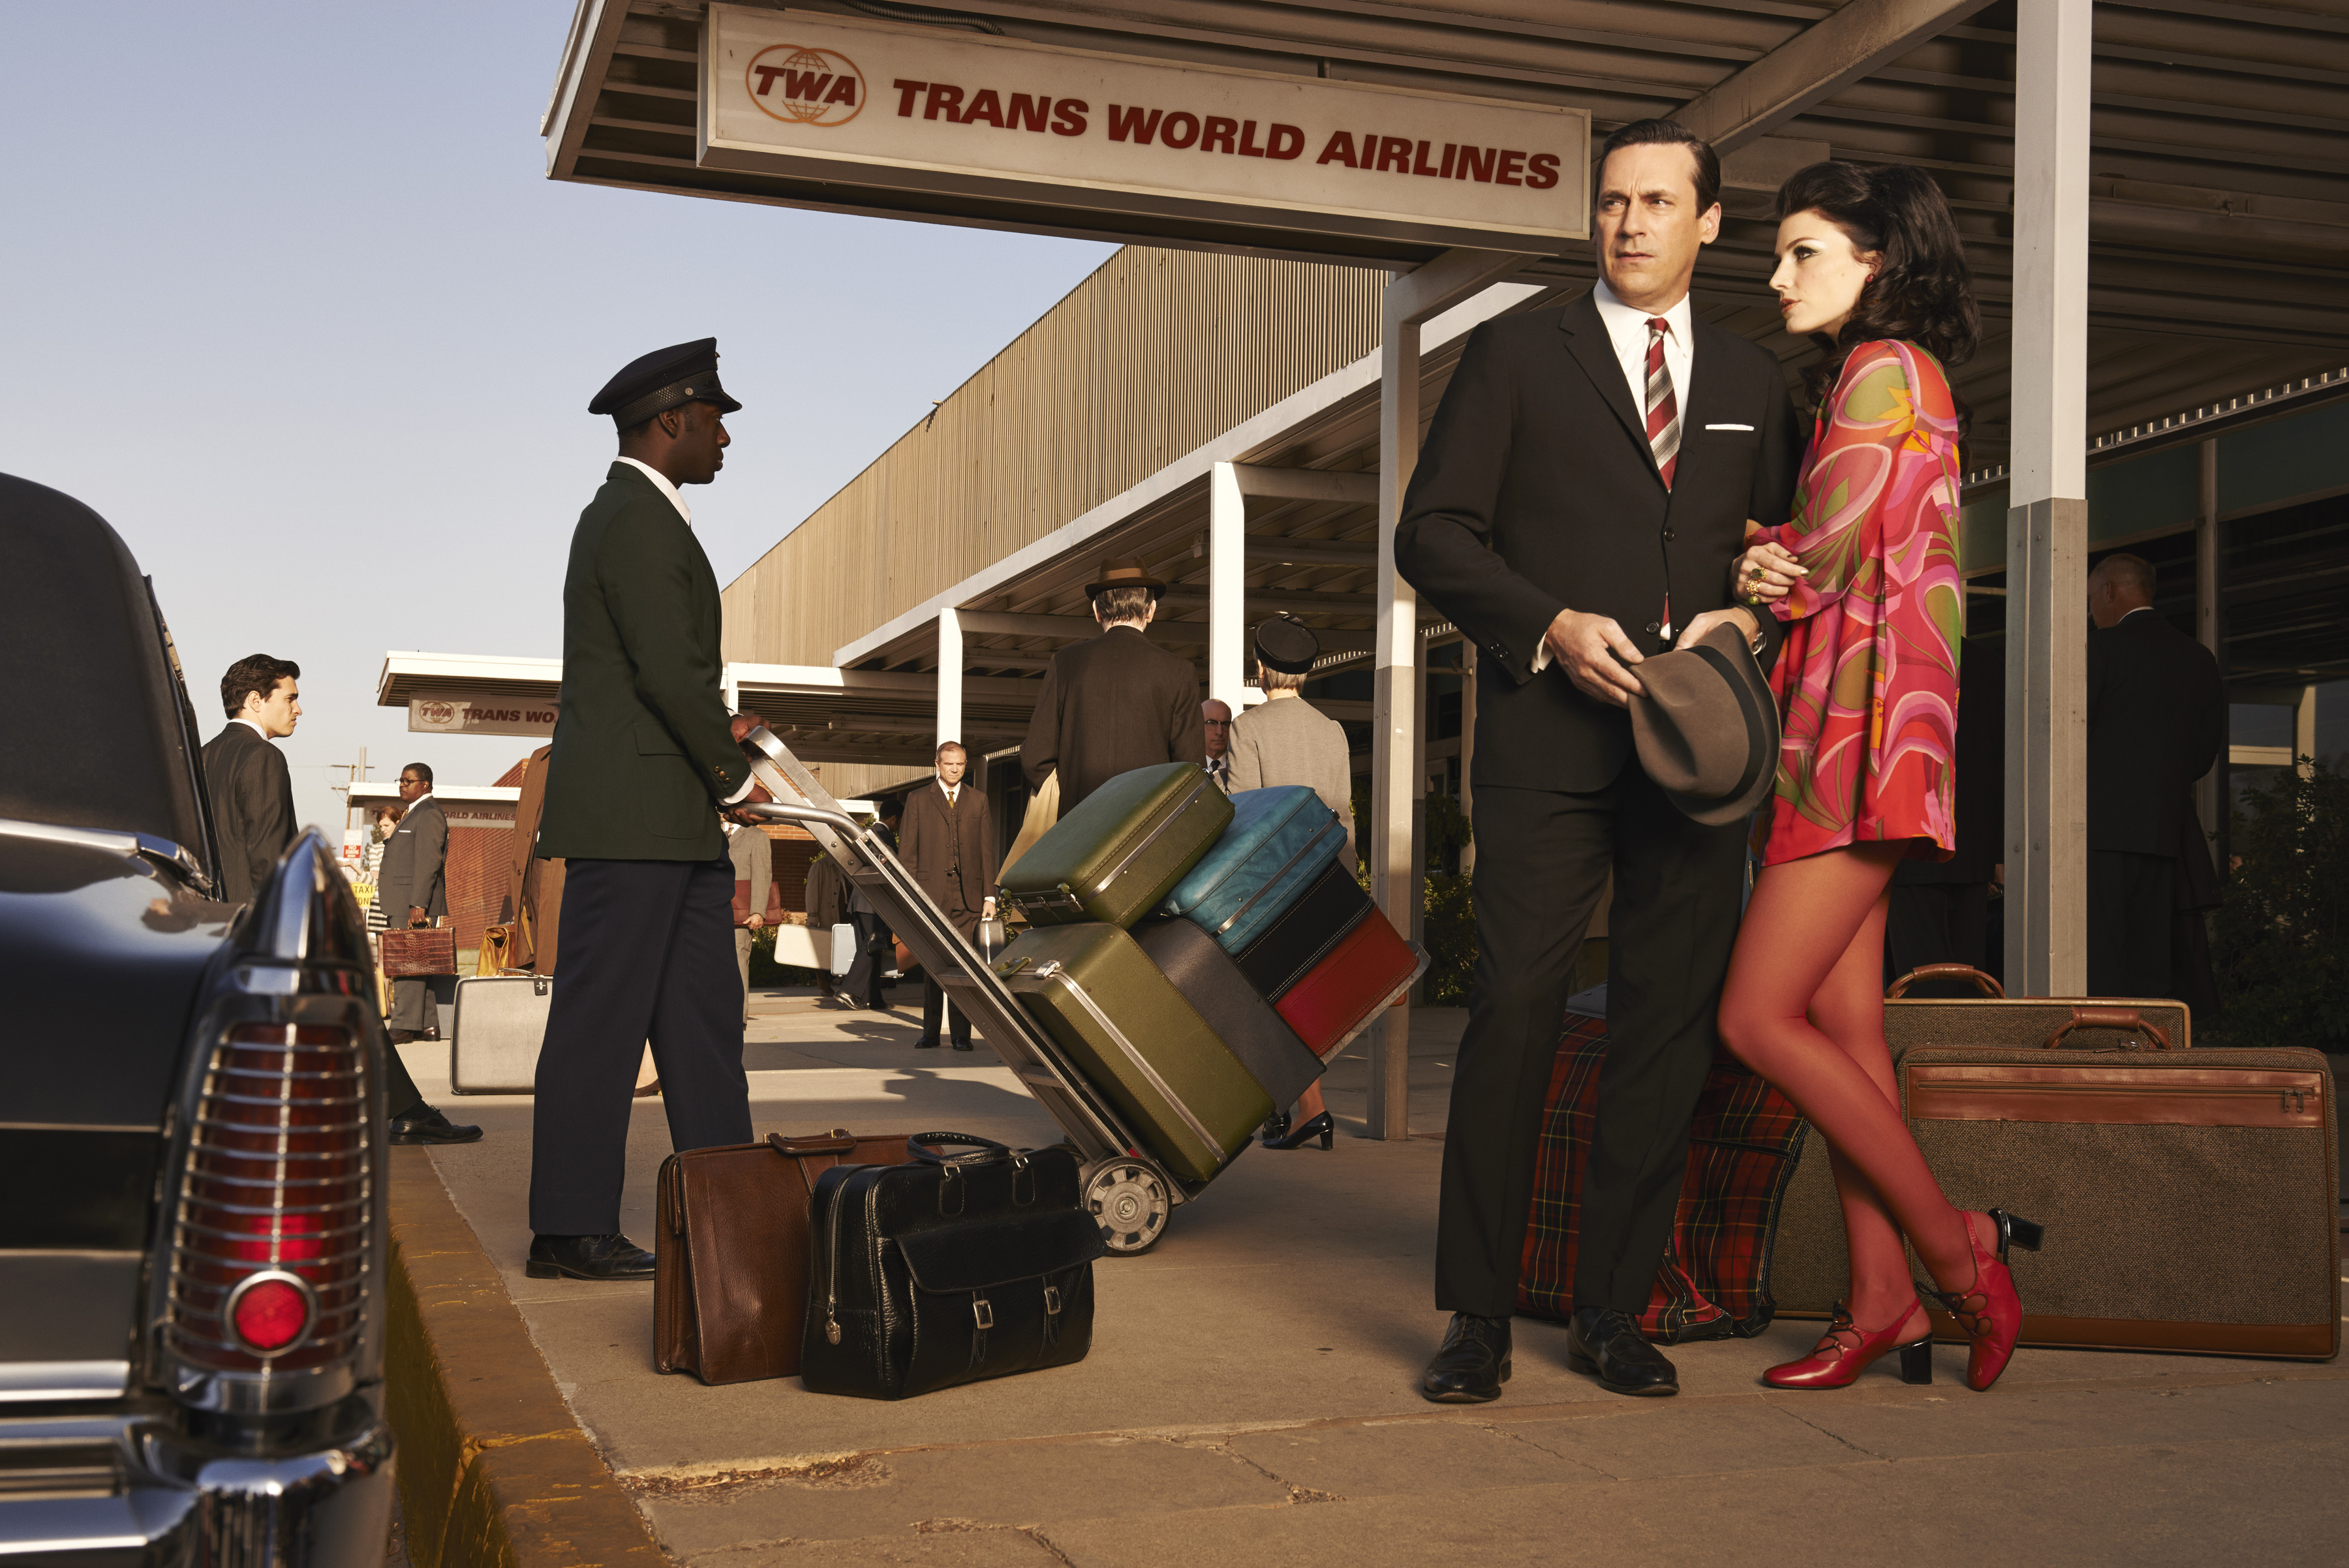 Don Draper (Jon Hamm) and Megan Draper (Jessica Pare), from Season 7 of AMC's Mad Men.